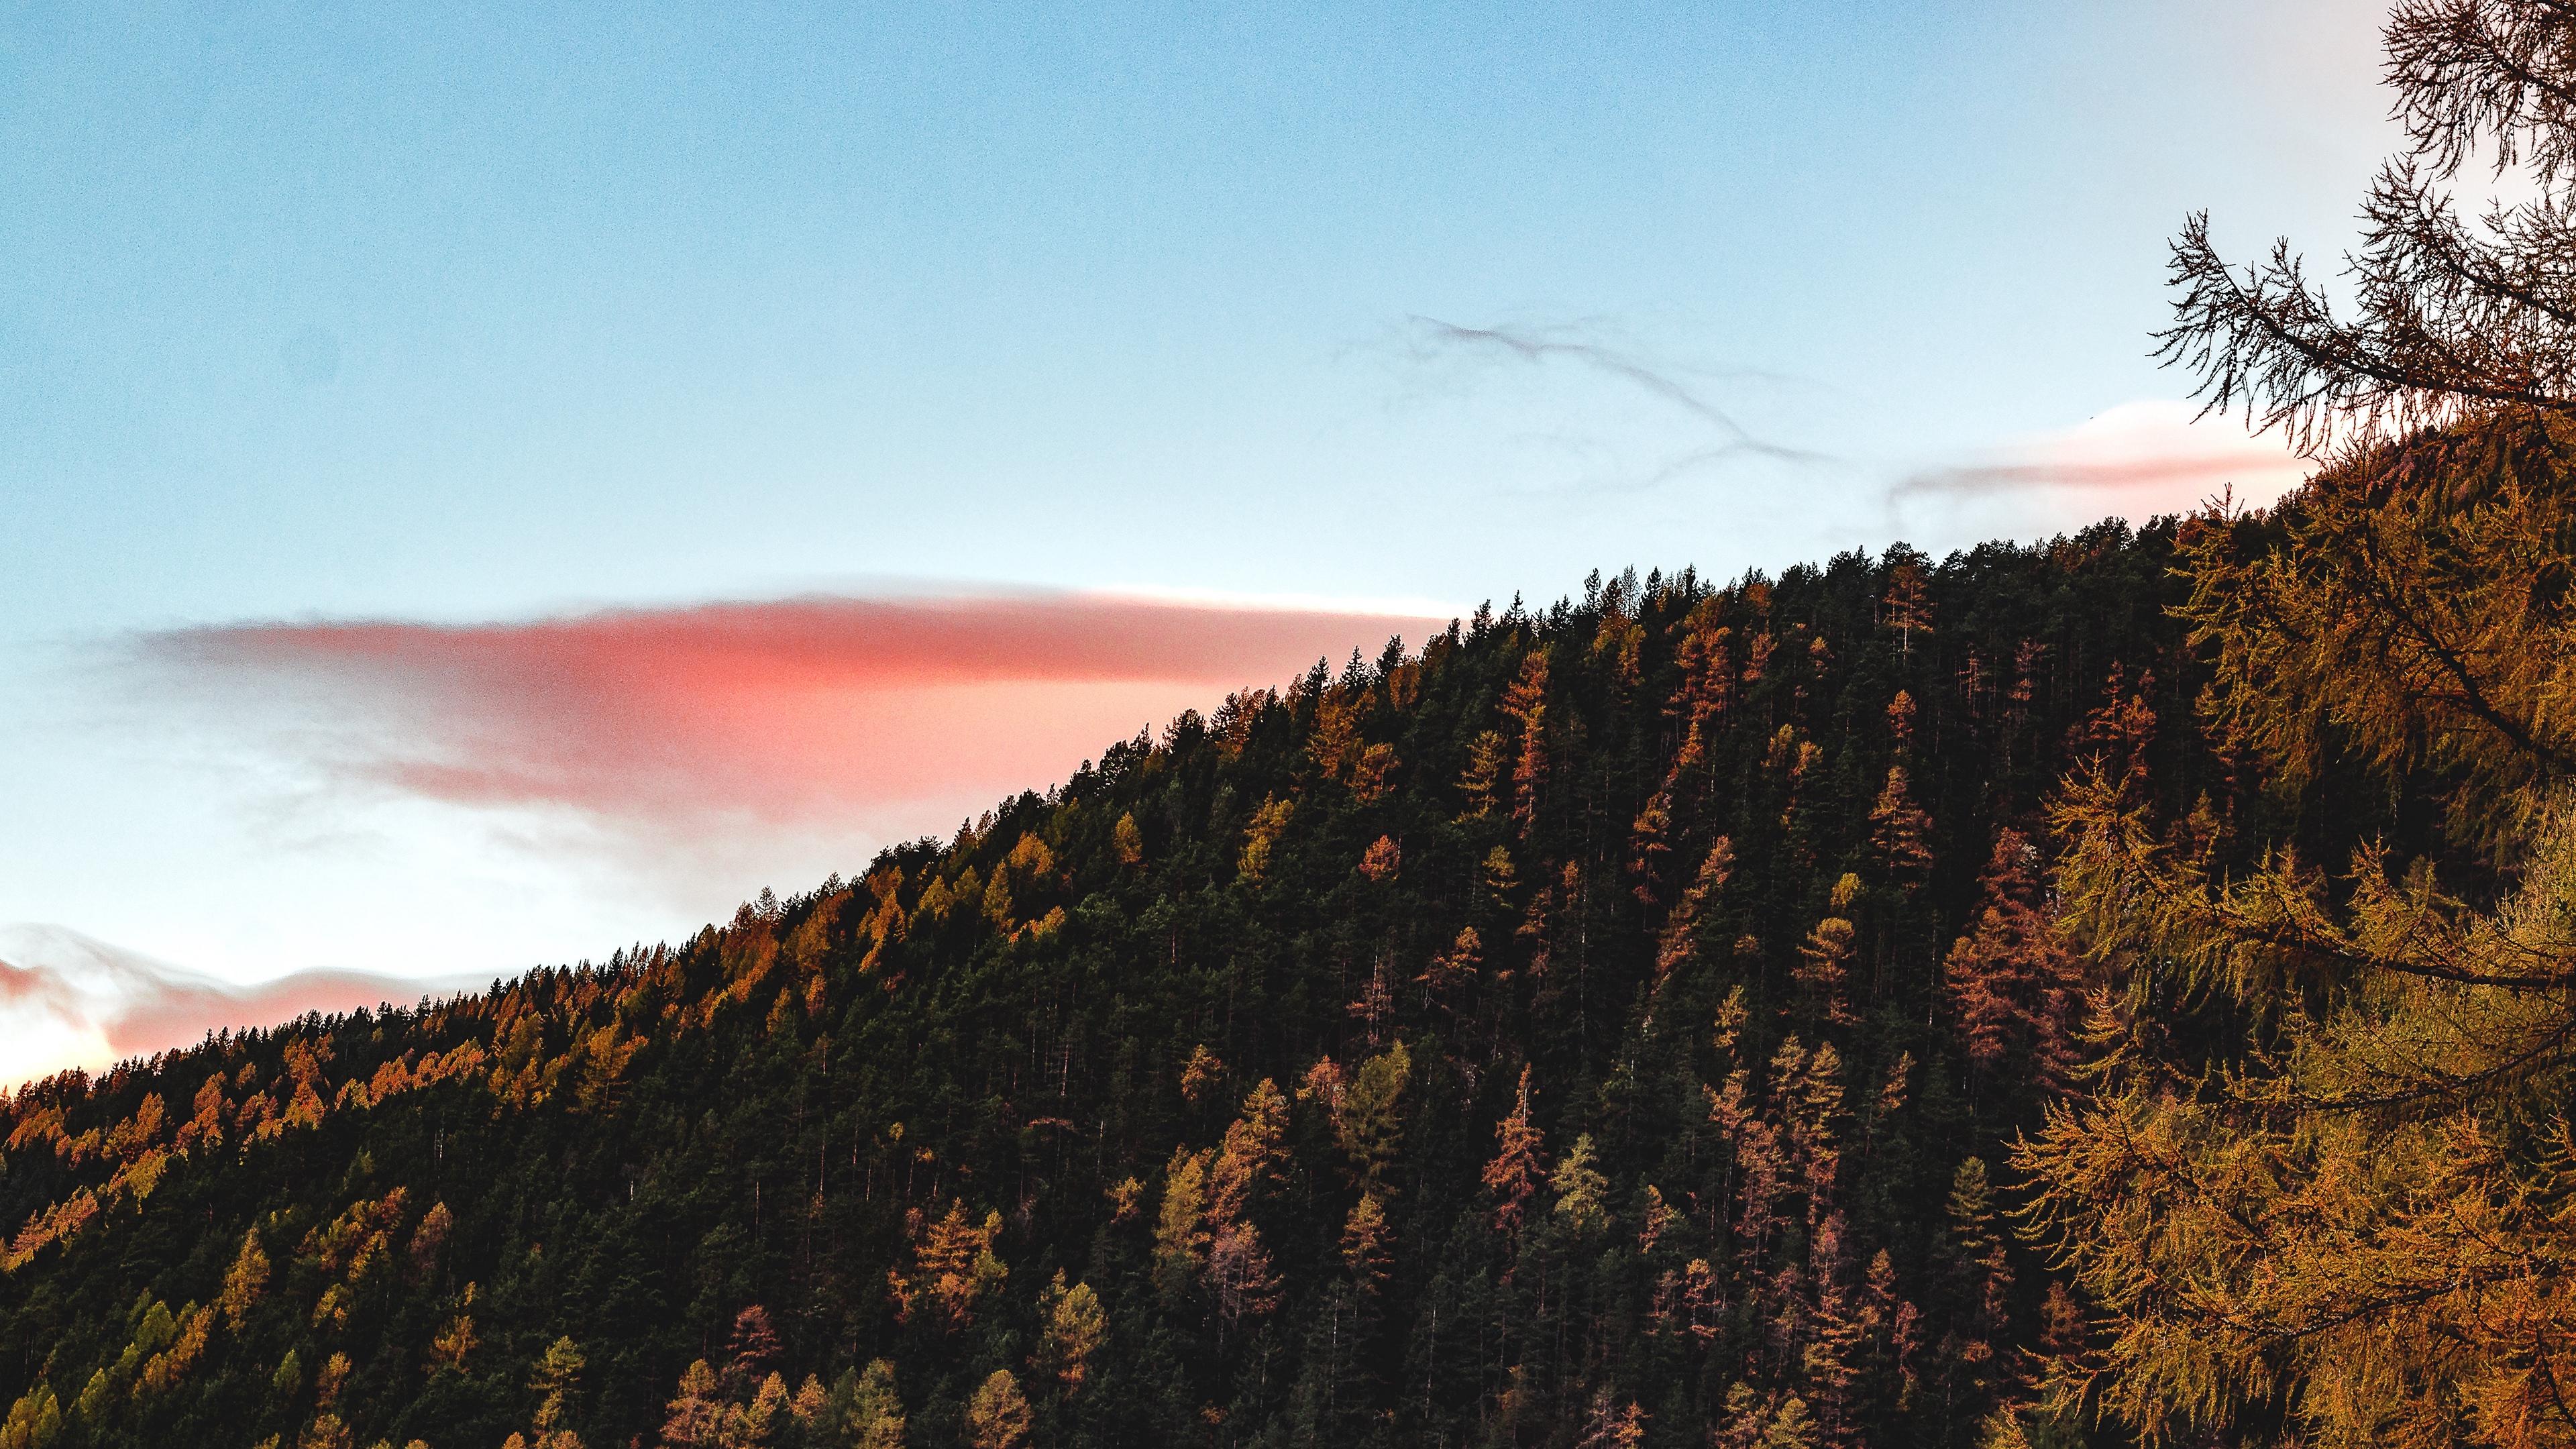 trees sky autumn hill 4k 1541114076 - trees, sky, autumn, hill 4k - Trees, Sky, Autumn